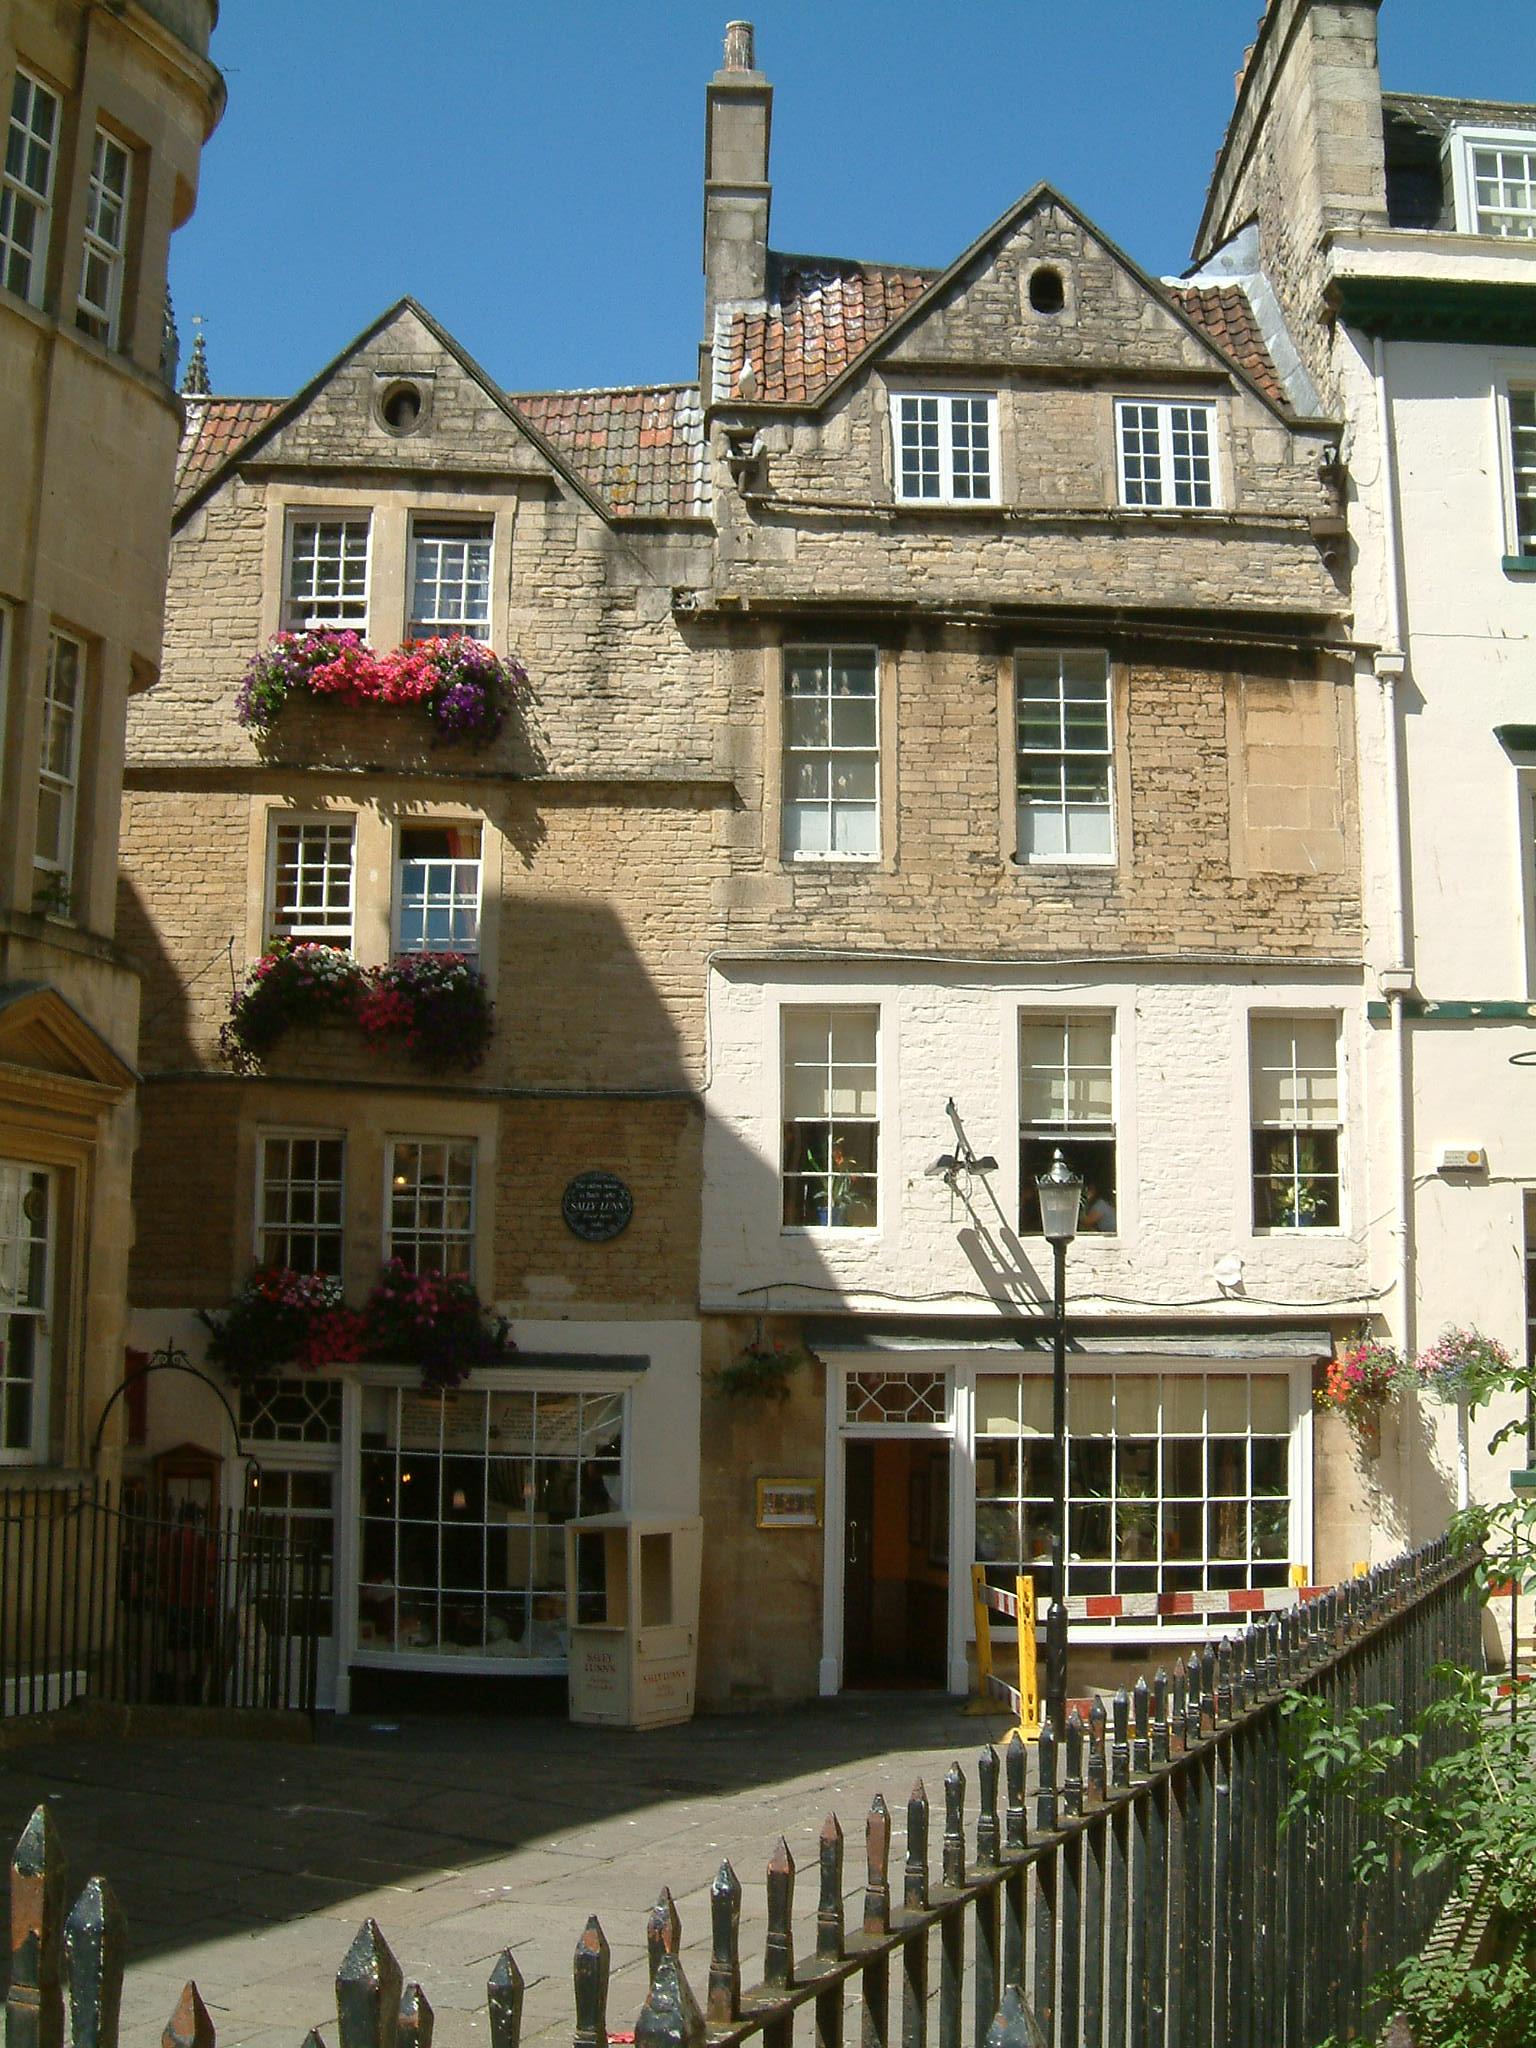 File:Bath Sally Lunn's House.JPG - Wikimedia Commons